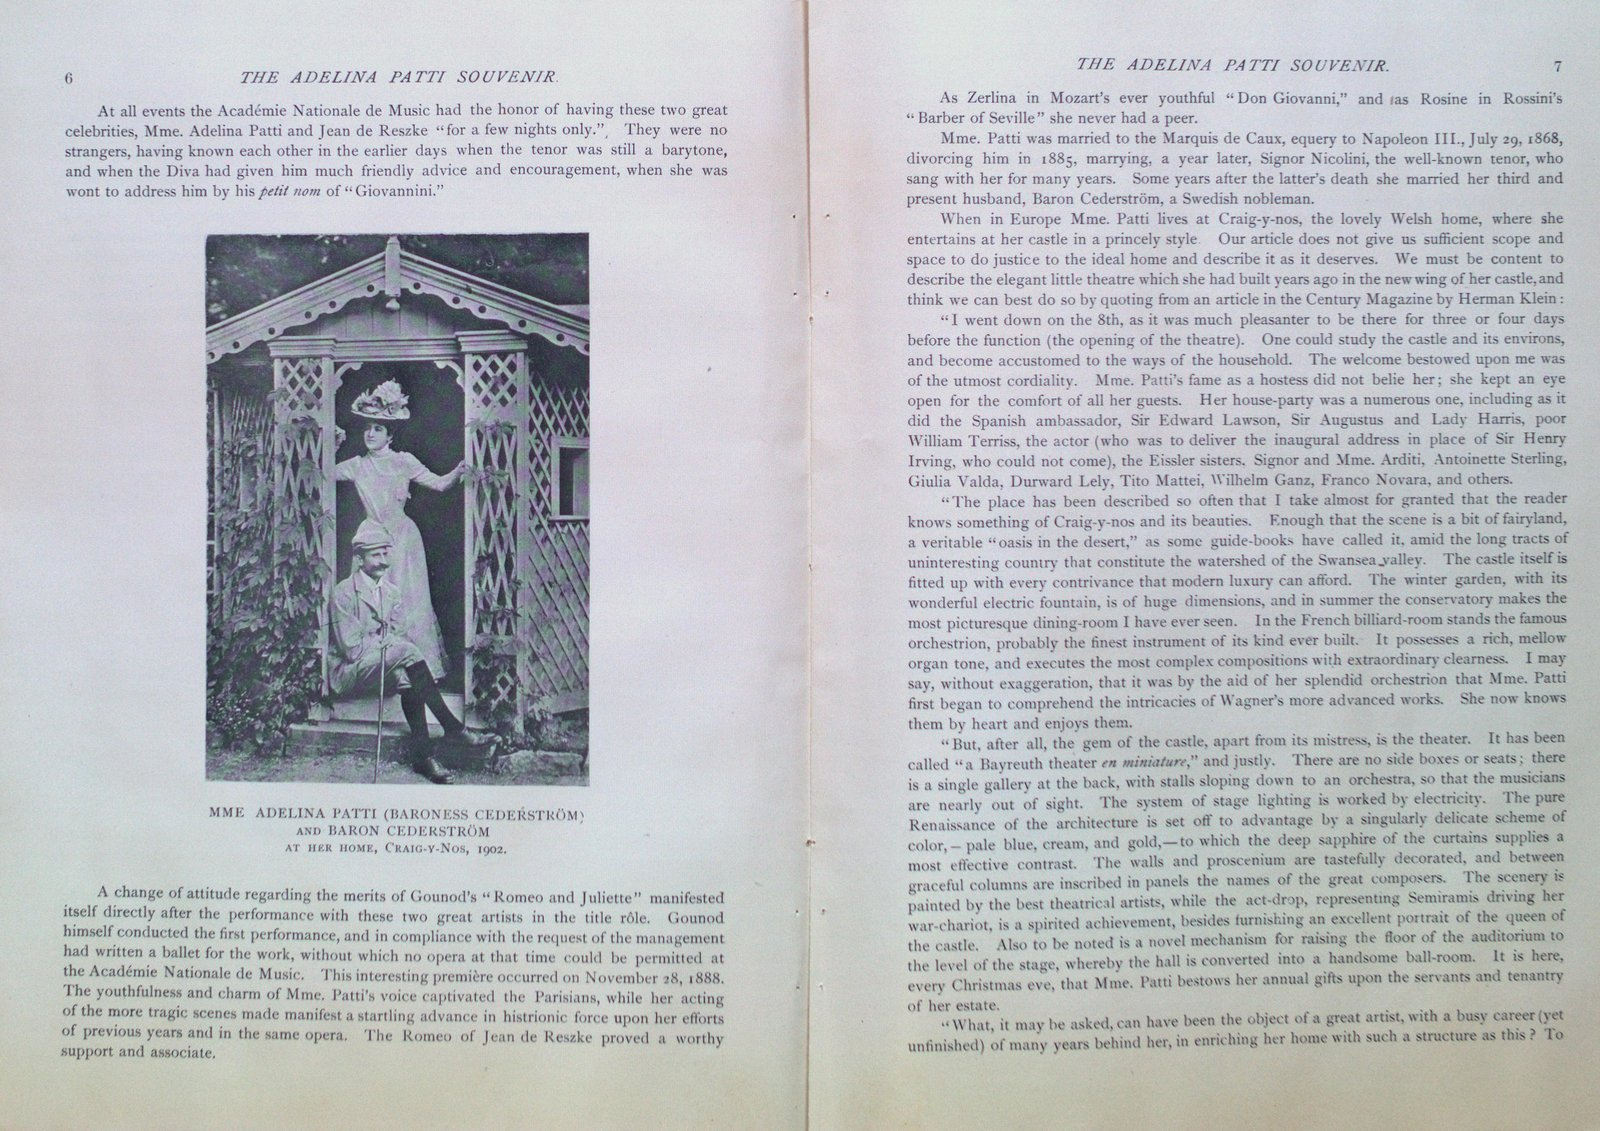 Teresa Vanderburgh's Musical Scrapbook #2 - Adelina Patti's Farewell Program